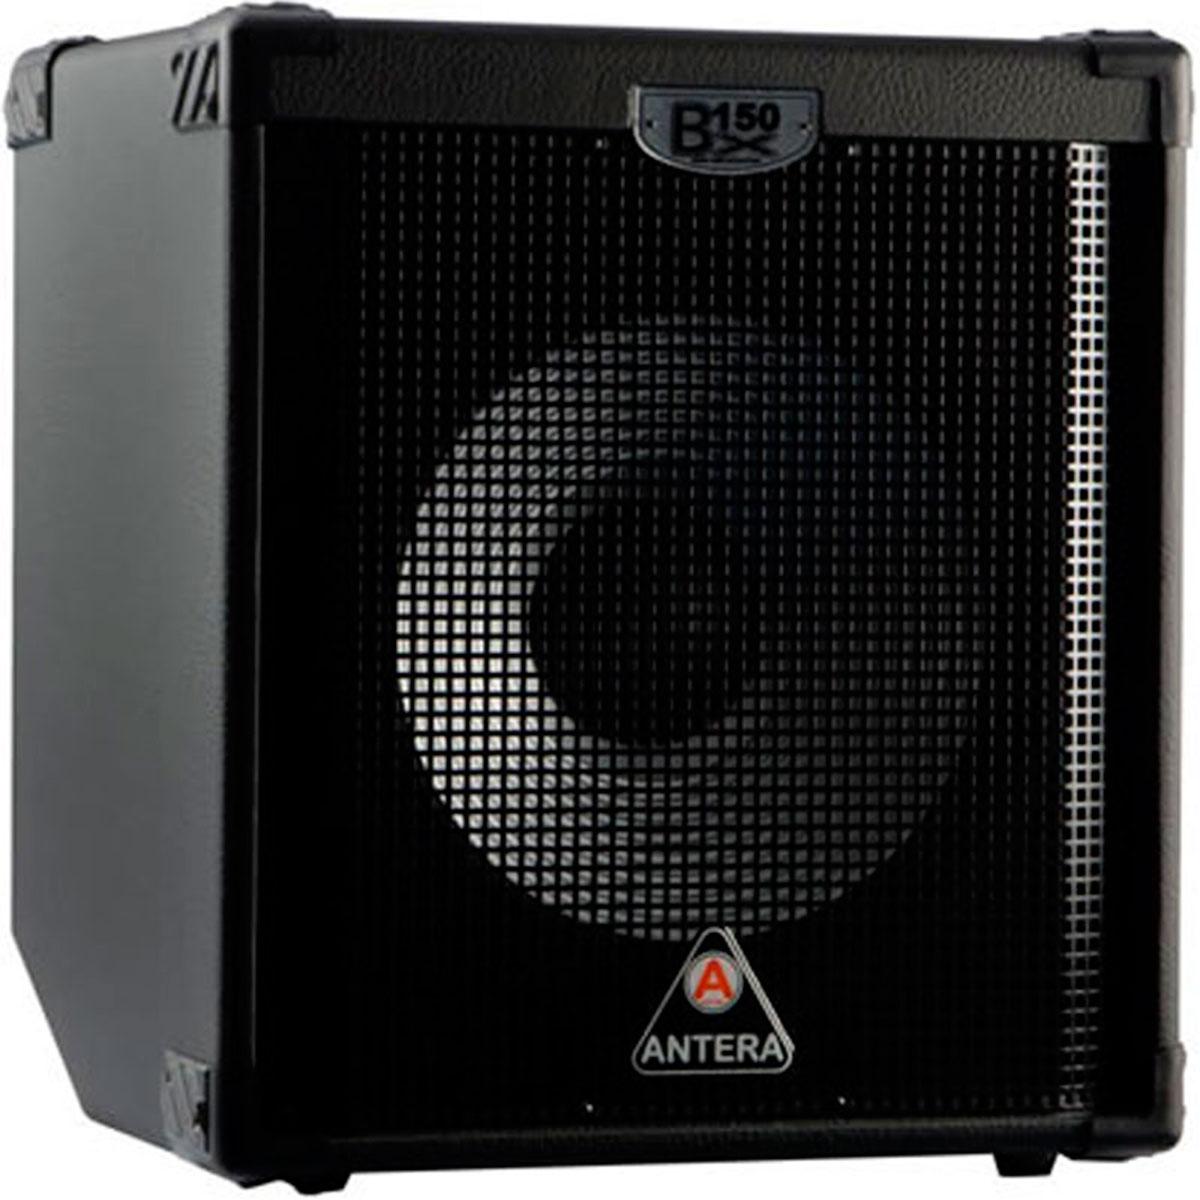 BX150 - Amplificador Combo p/ Contrabaixo 150W Preto BX 150 - Antera